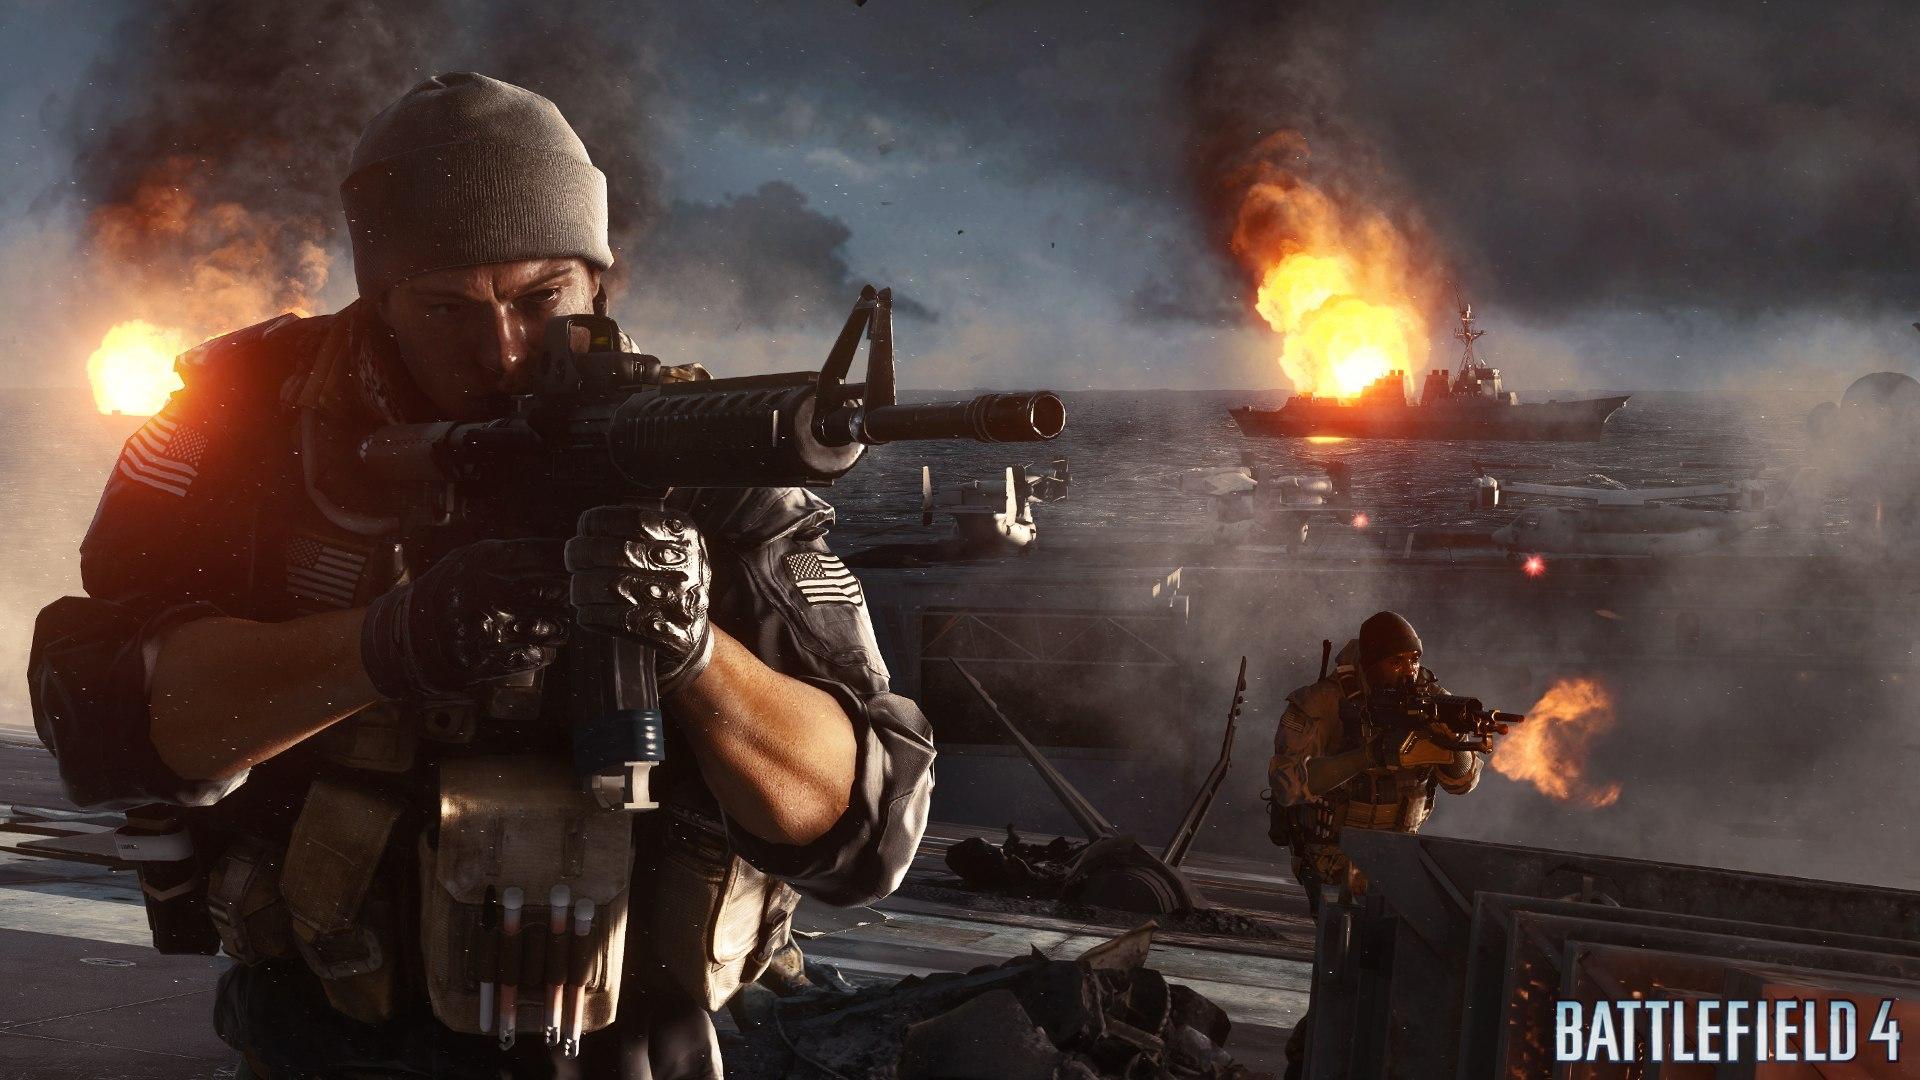 battlefield_4_-_angry_sea_single_player_screens_7_wm